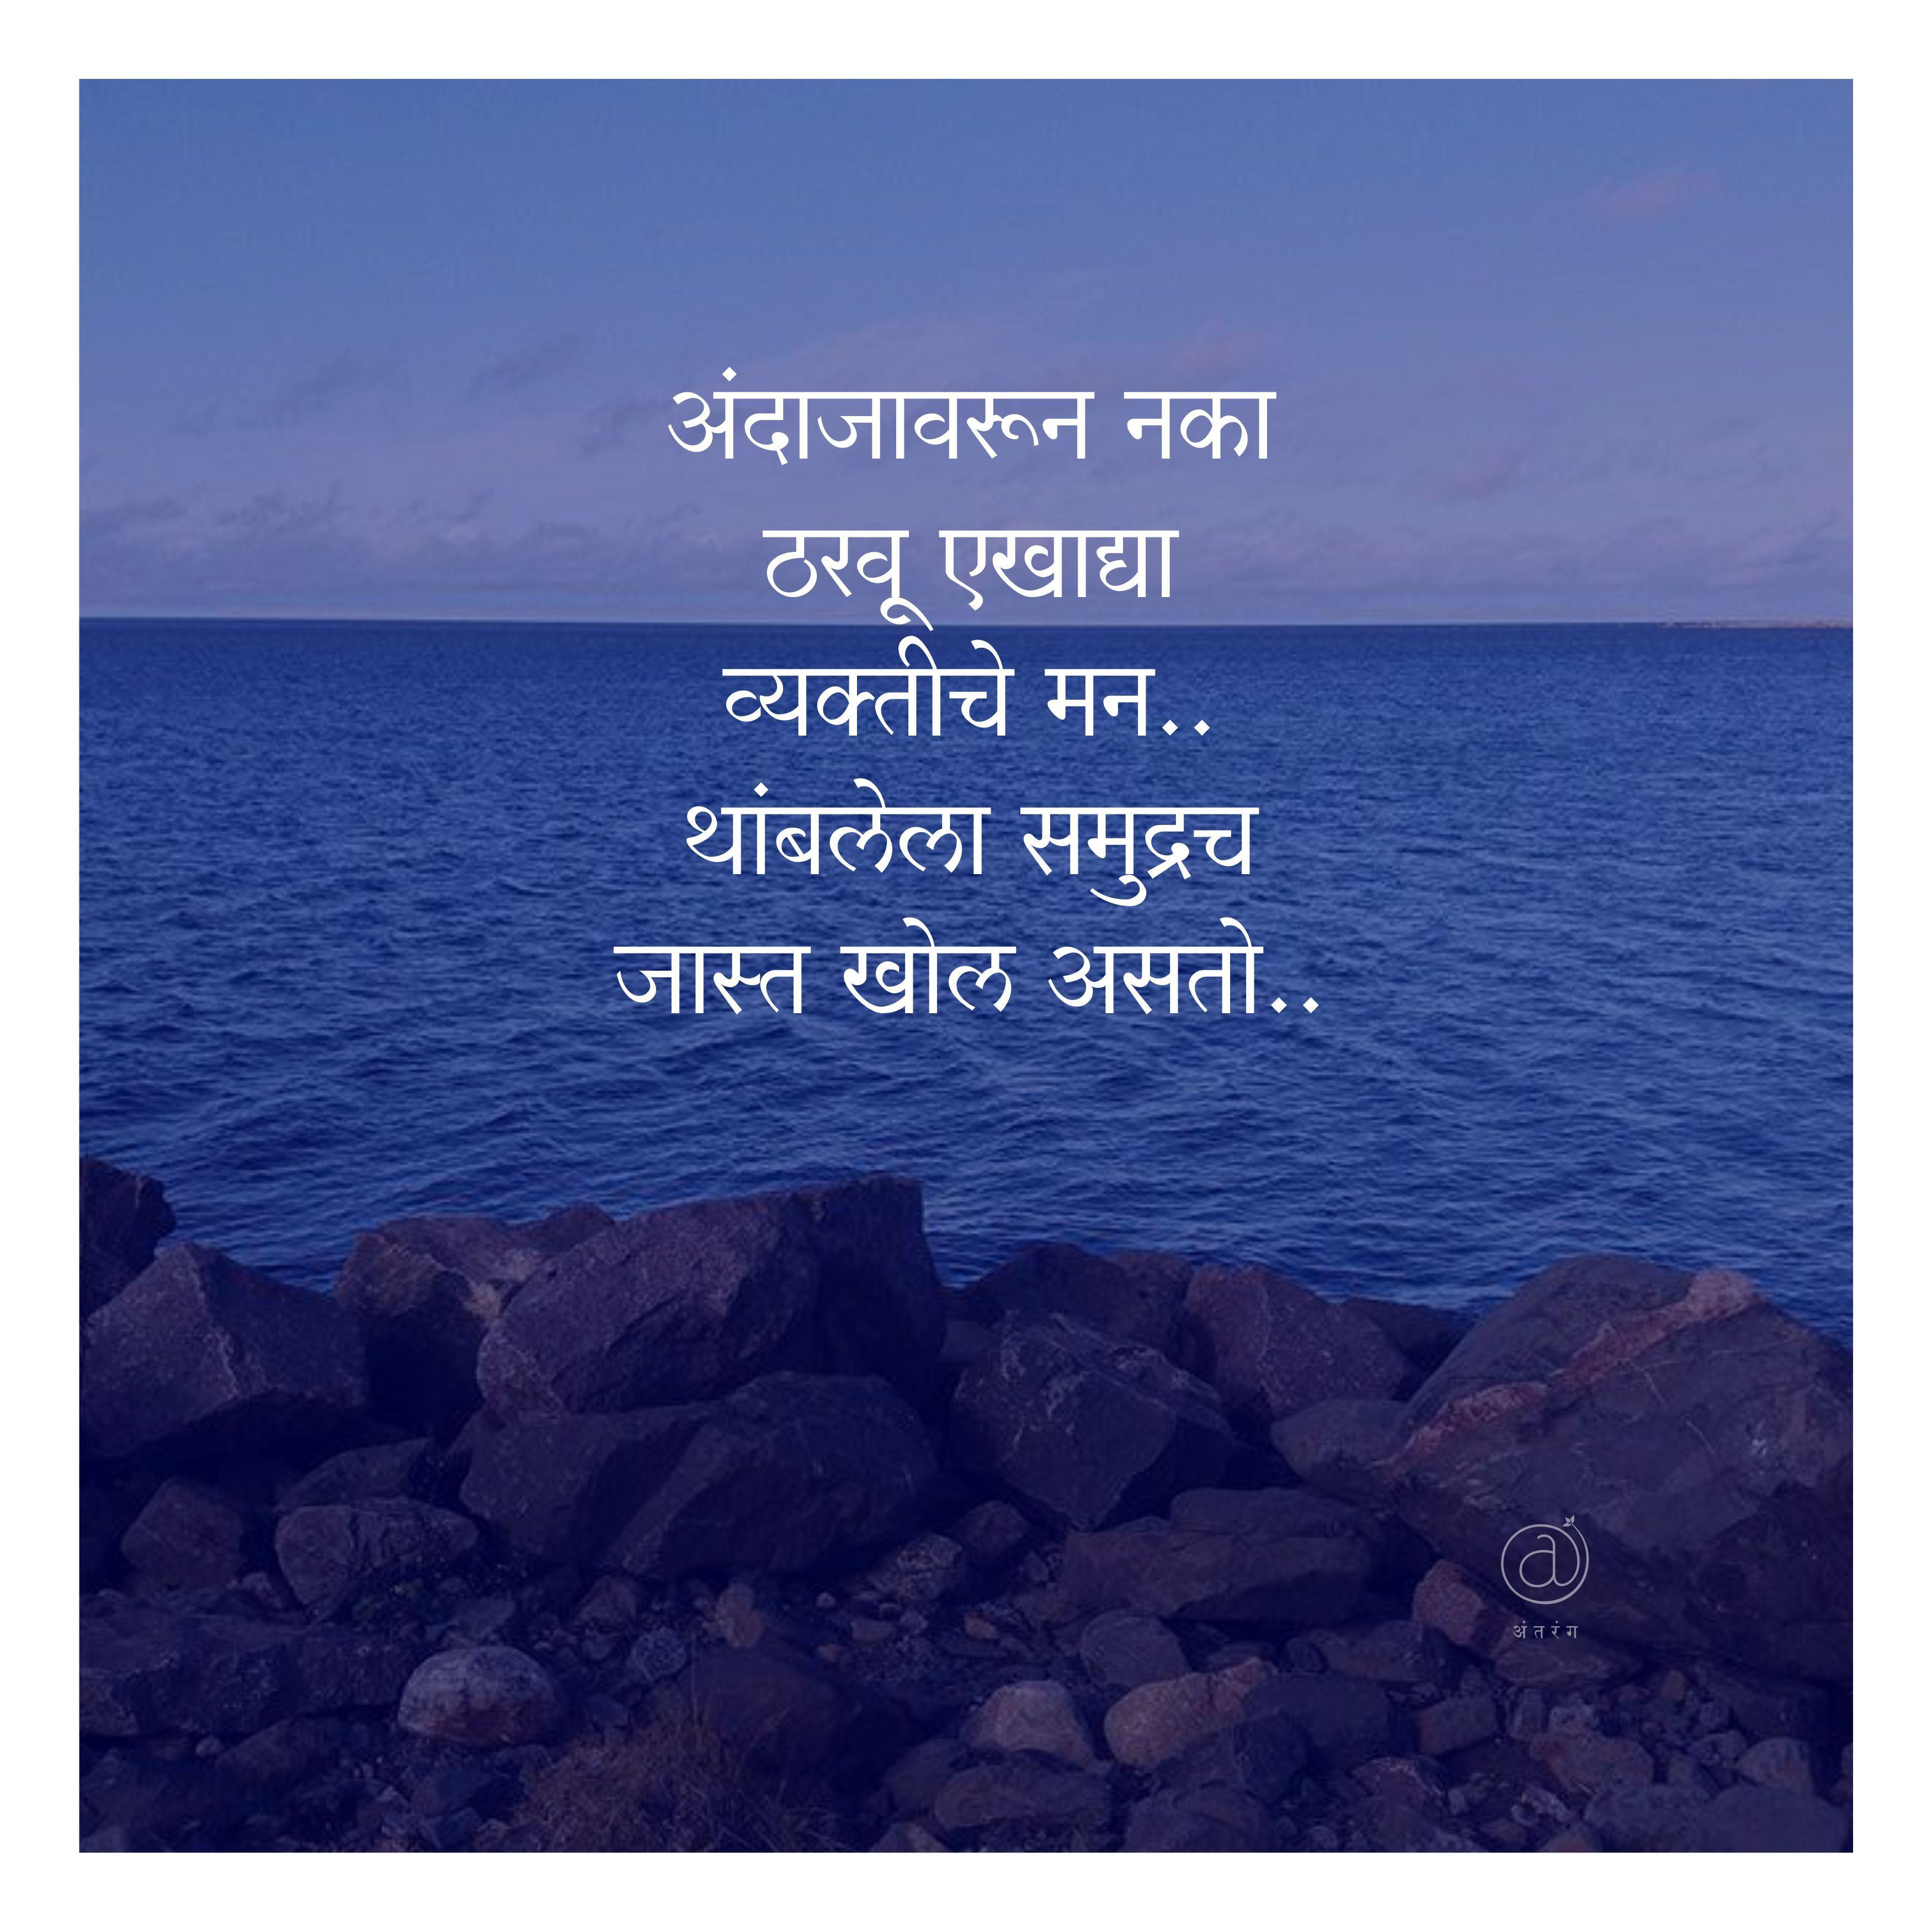 My Favorite Marathi Love Quotes Marathi Quotes Adorable Quotes